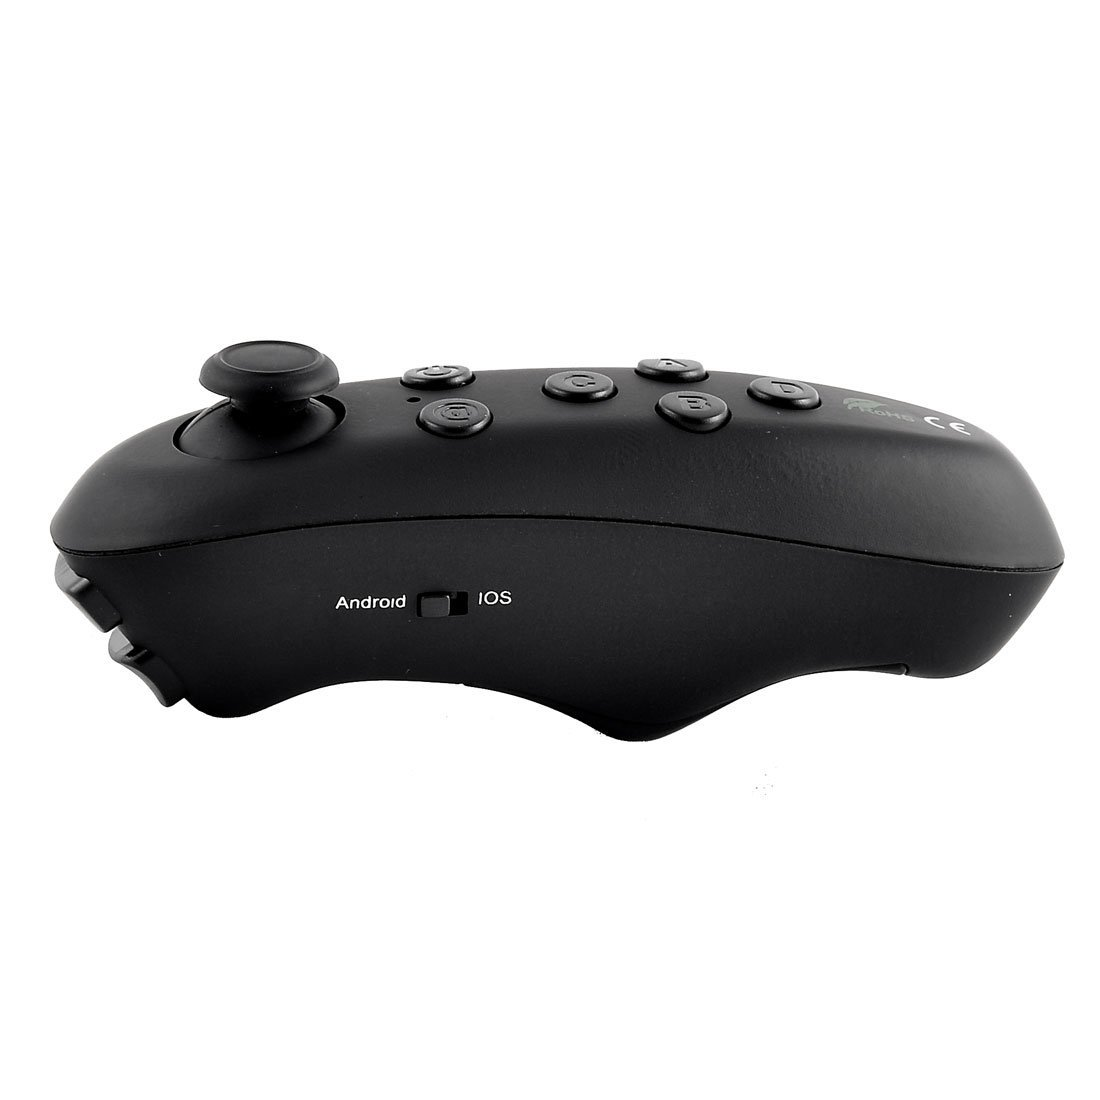 Amazon.com: eDealMax Portátil VR Lentes Bluetooth Juego de Control remoto Universal Manilla Negro: Electronics